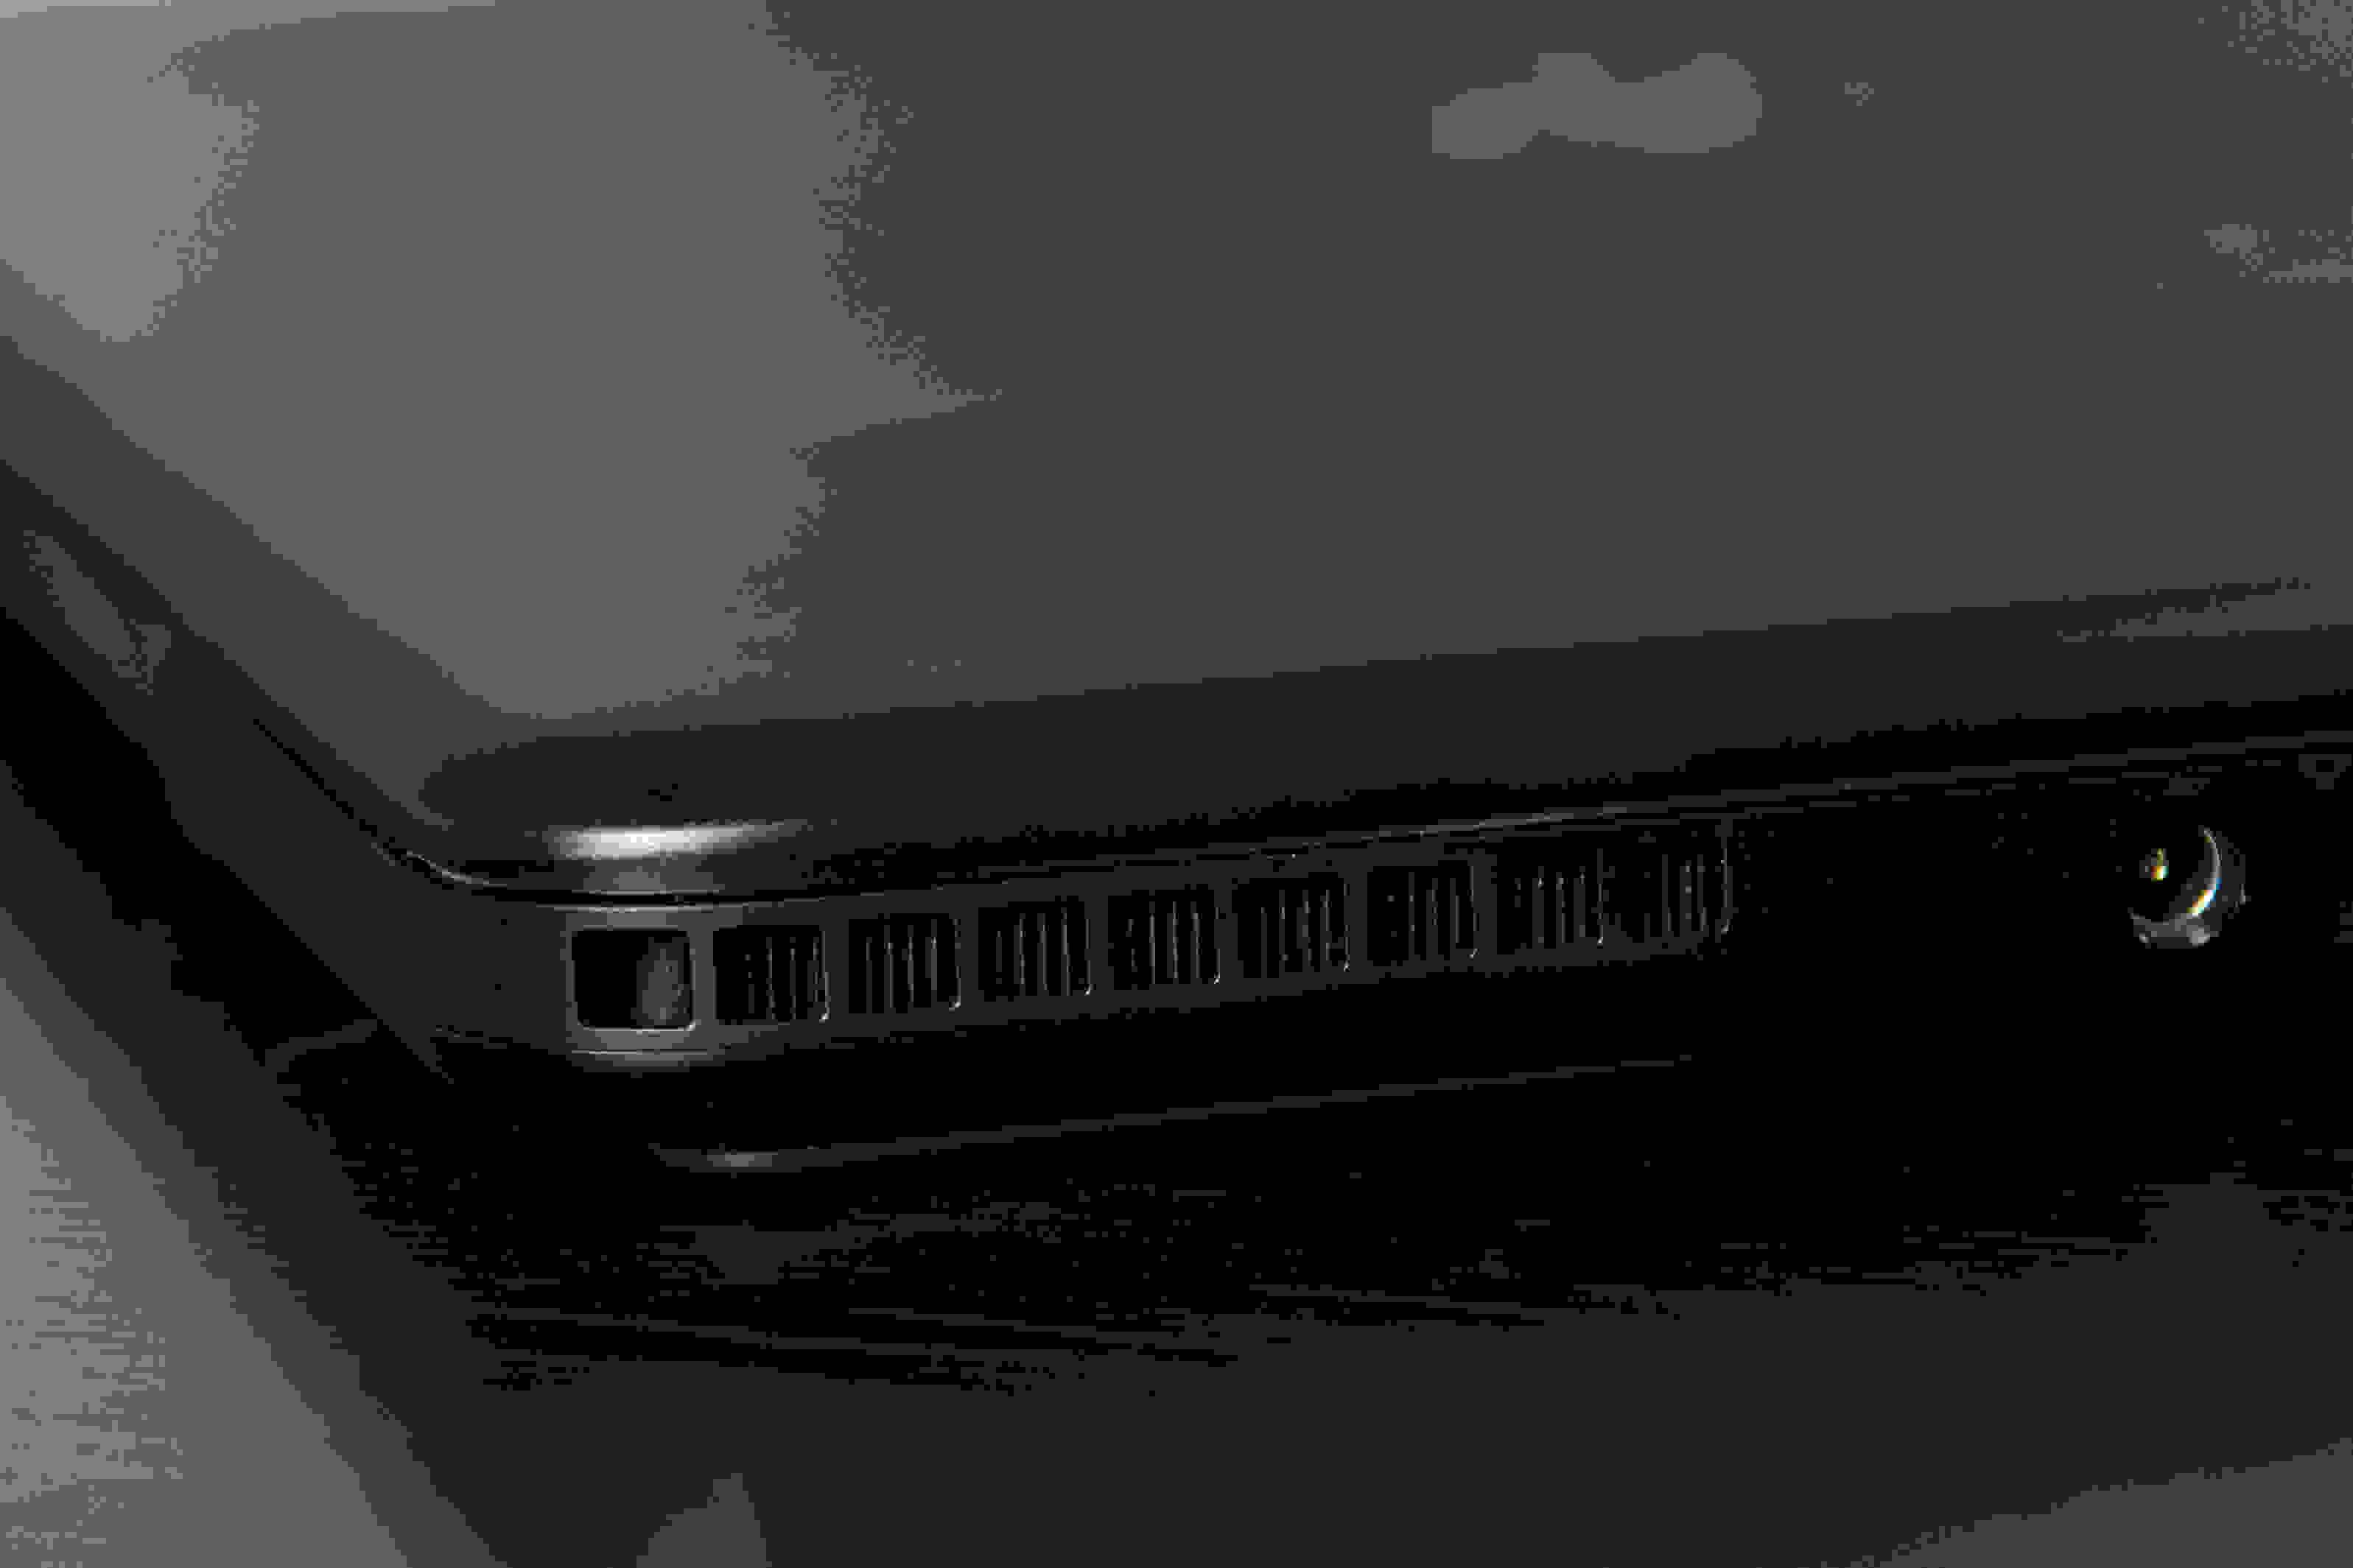 A photo of the Razer Blade Pro's exhaust.